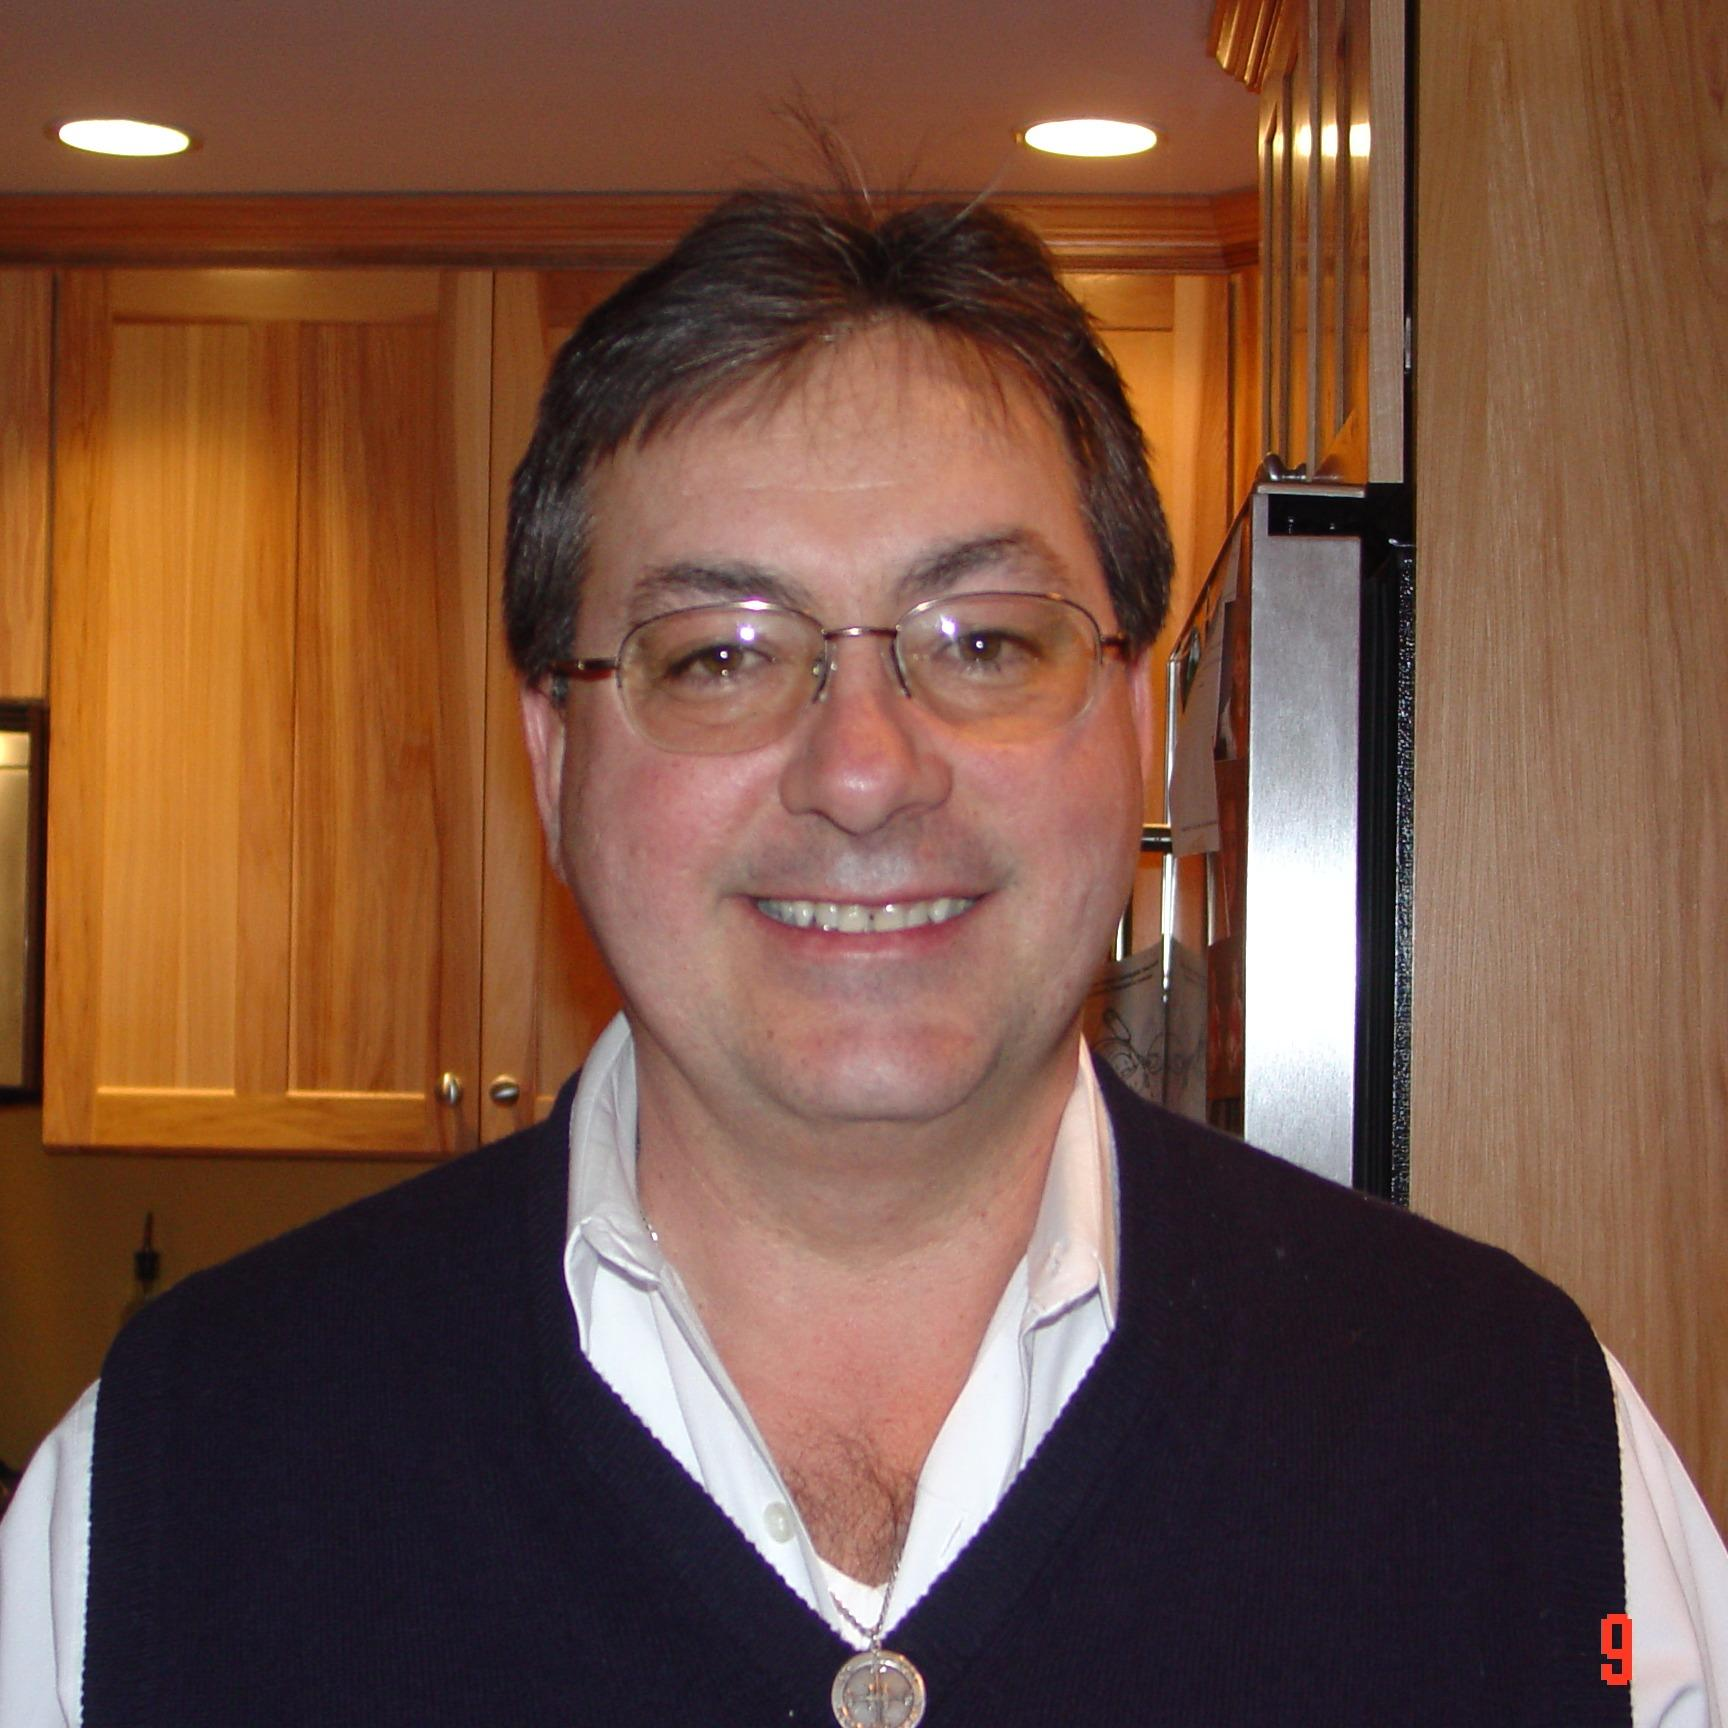 Michael R. Woods Public Insurance Adjuster in Randolph, MA ...